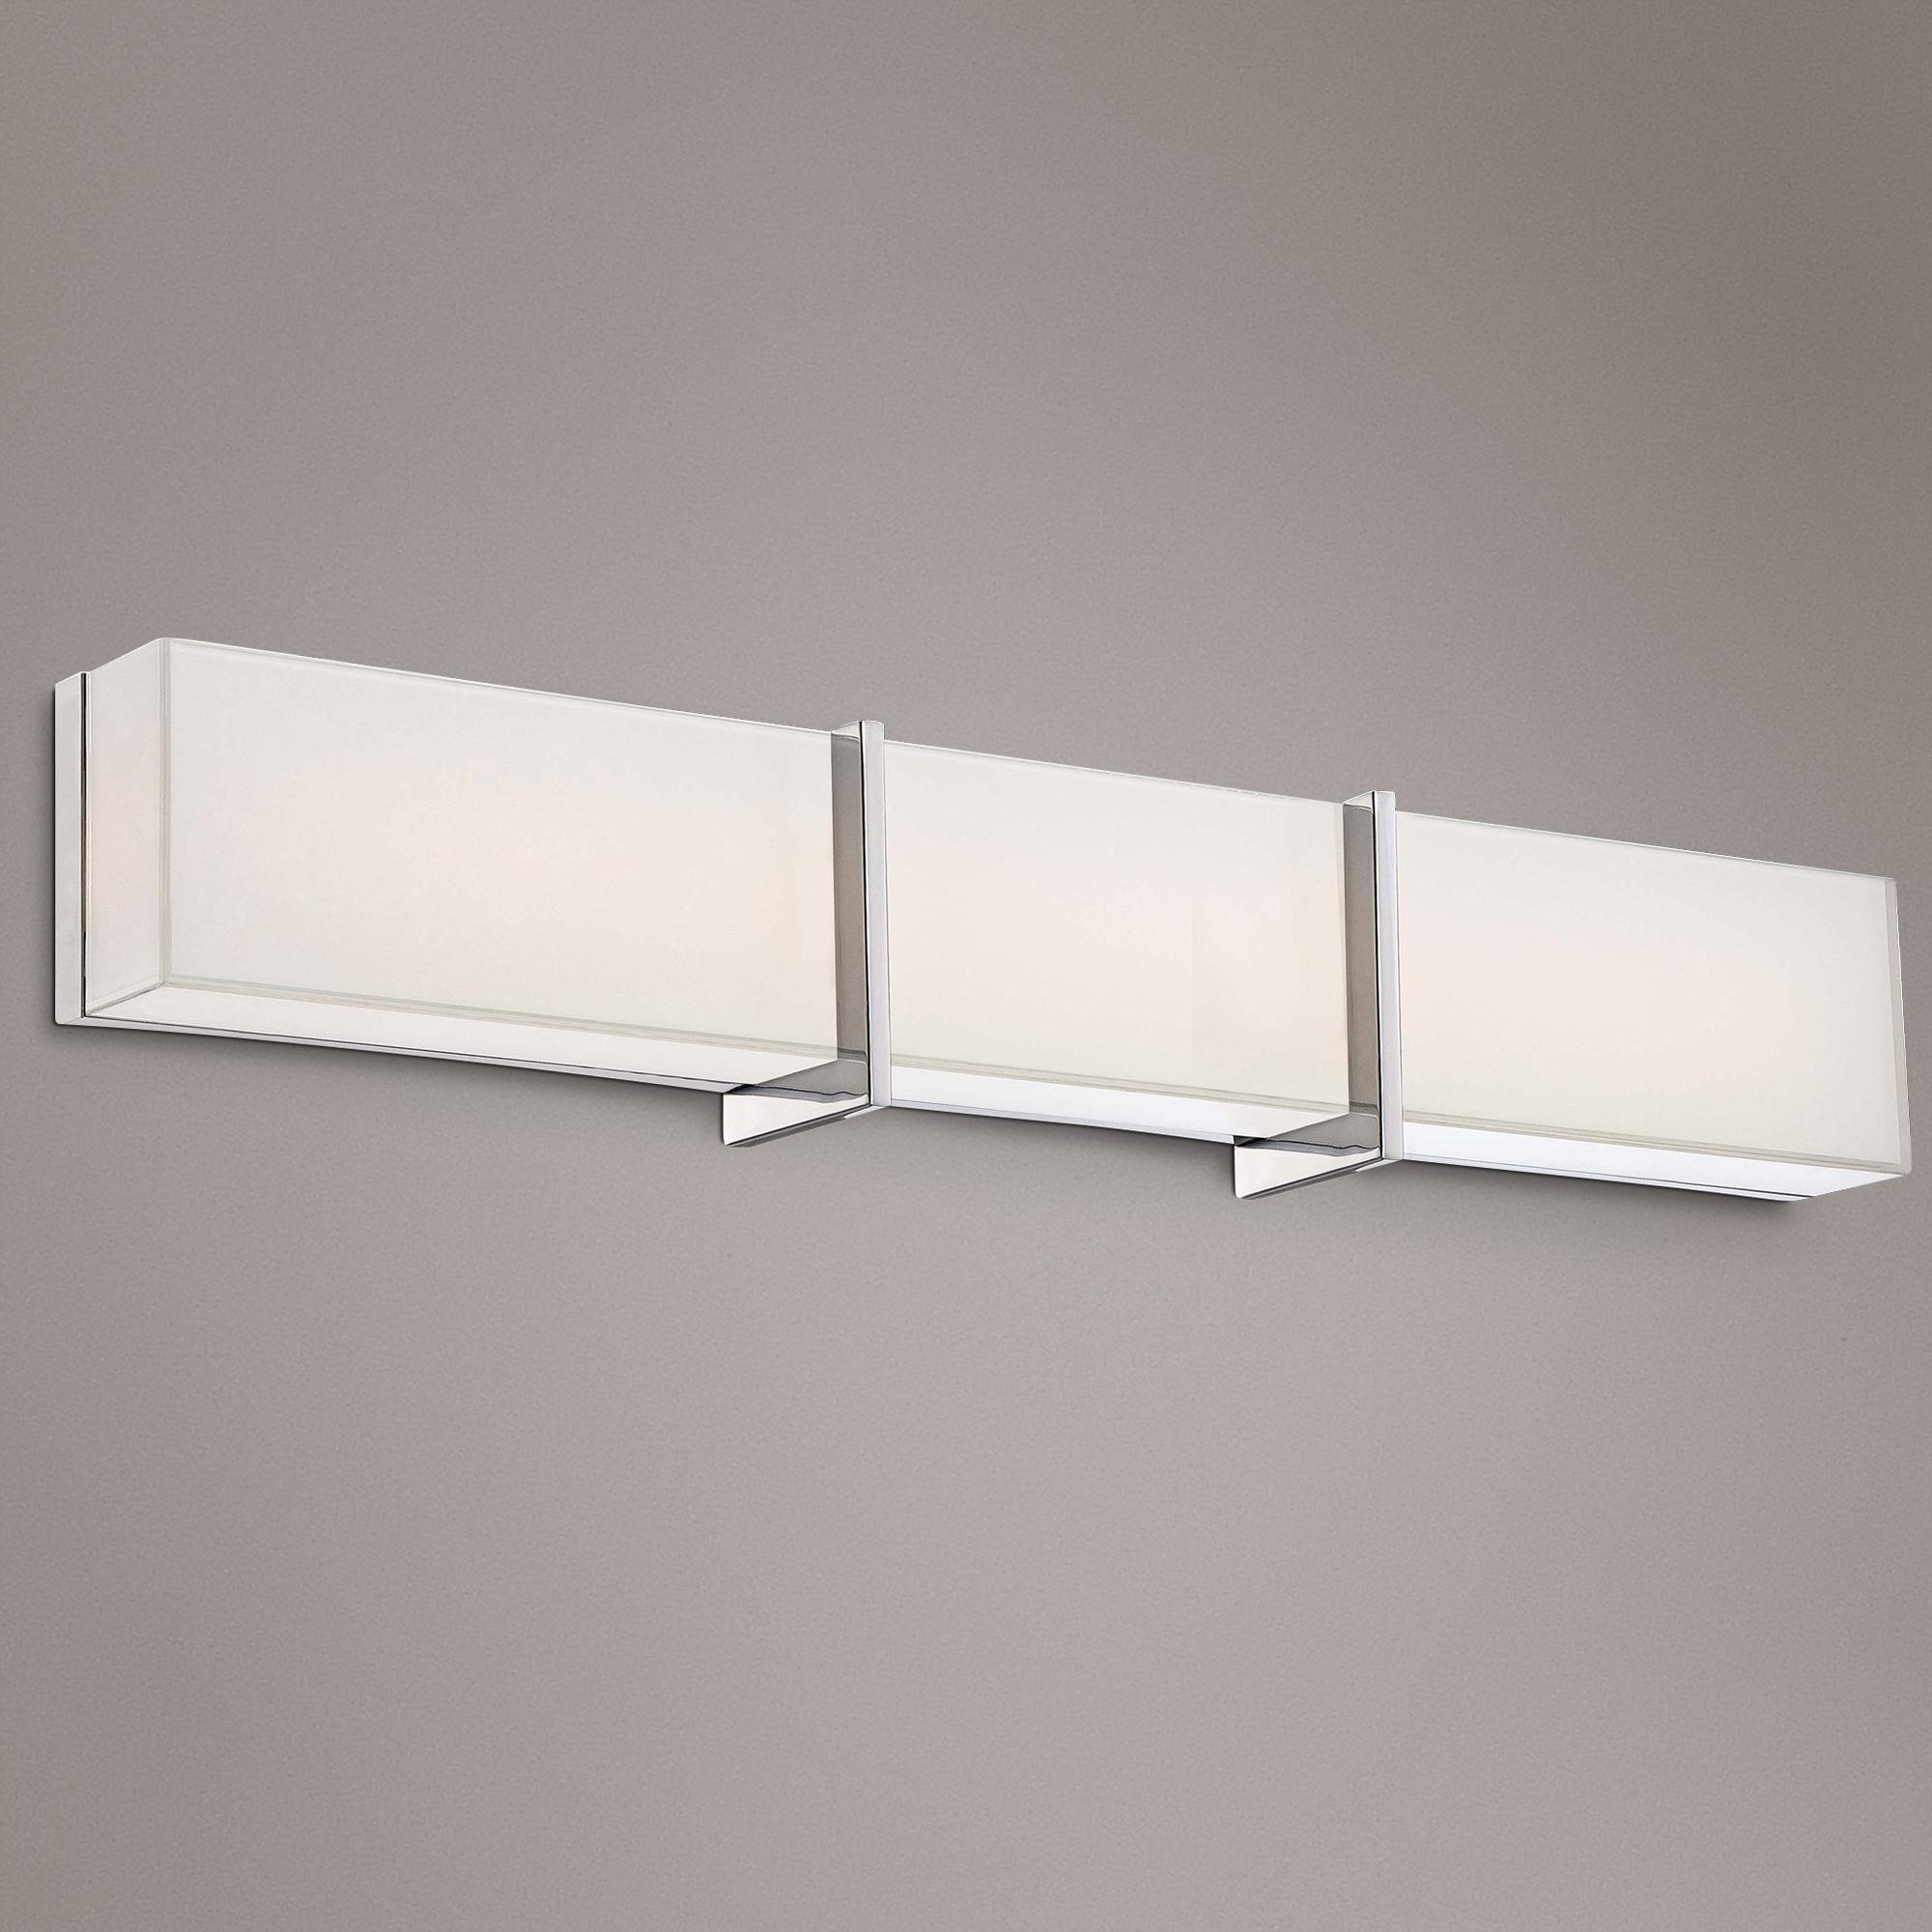 lights depot strip of vanity home ikea plug bathroom mirror light chrome in size full ideas lighting large